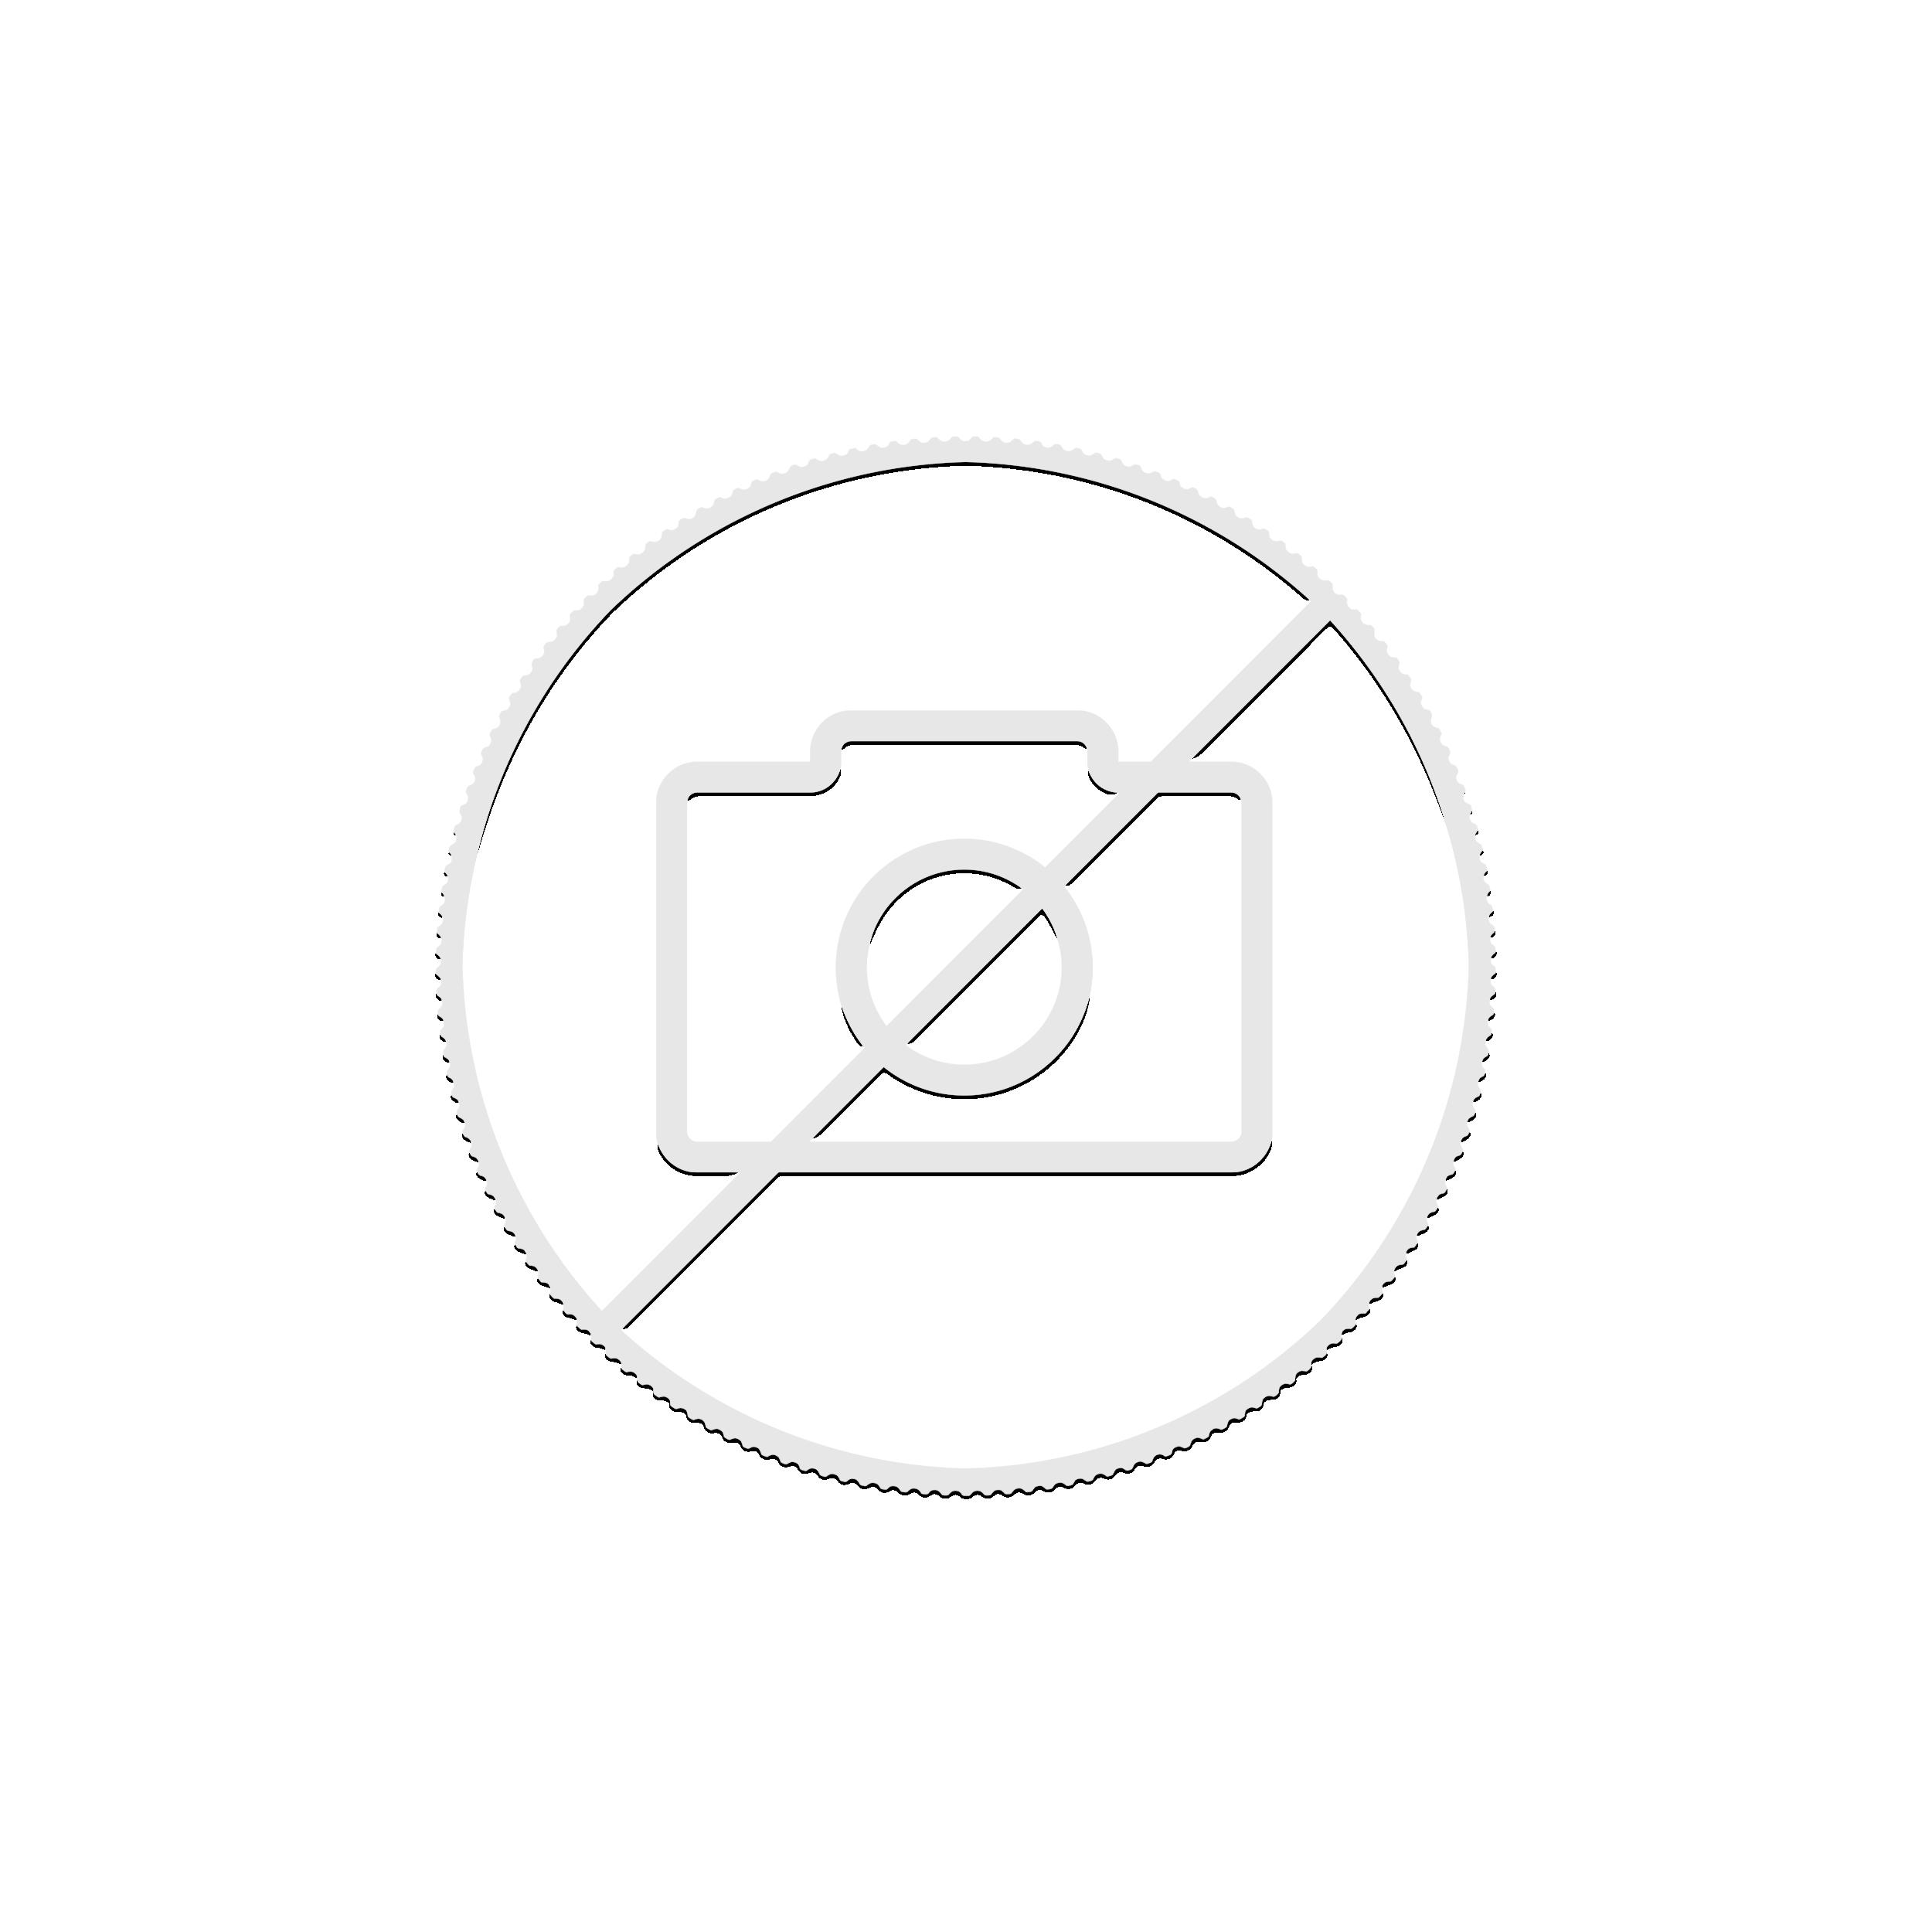 Gouden American Buffalo Munten 2019 Zilver En Goud Kopen